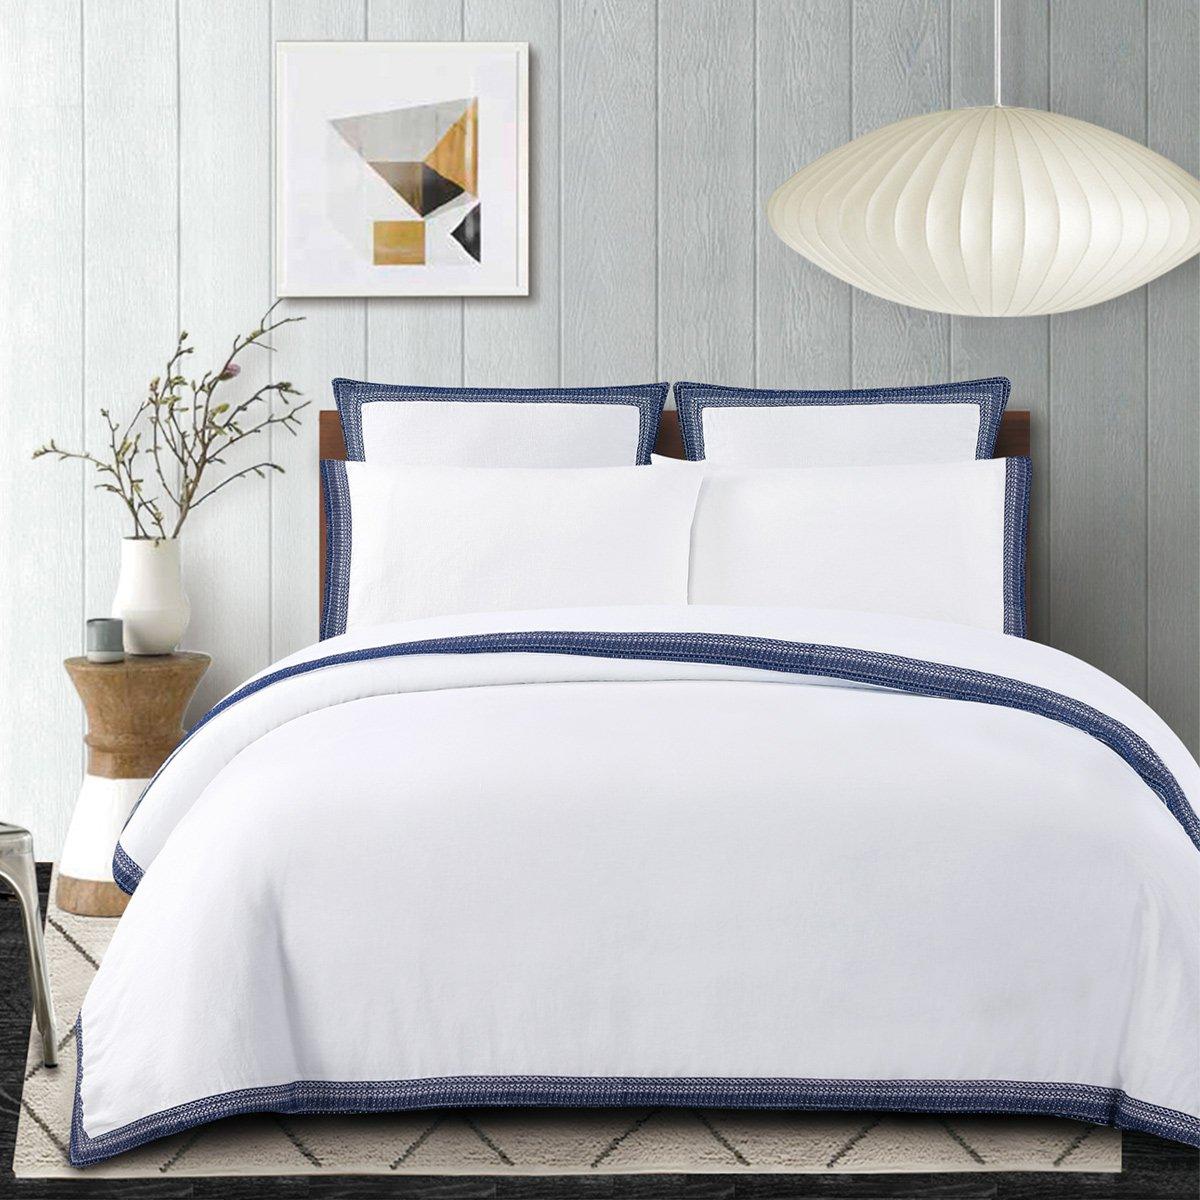 Indigo bluee King Echelon Home Sofia Embroidered Belgian Linen Sheet Set, Queen, Indigo bluee